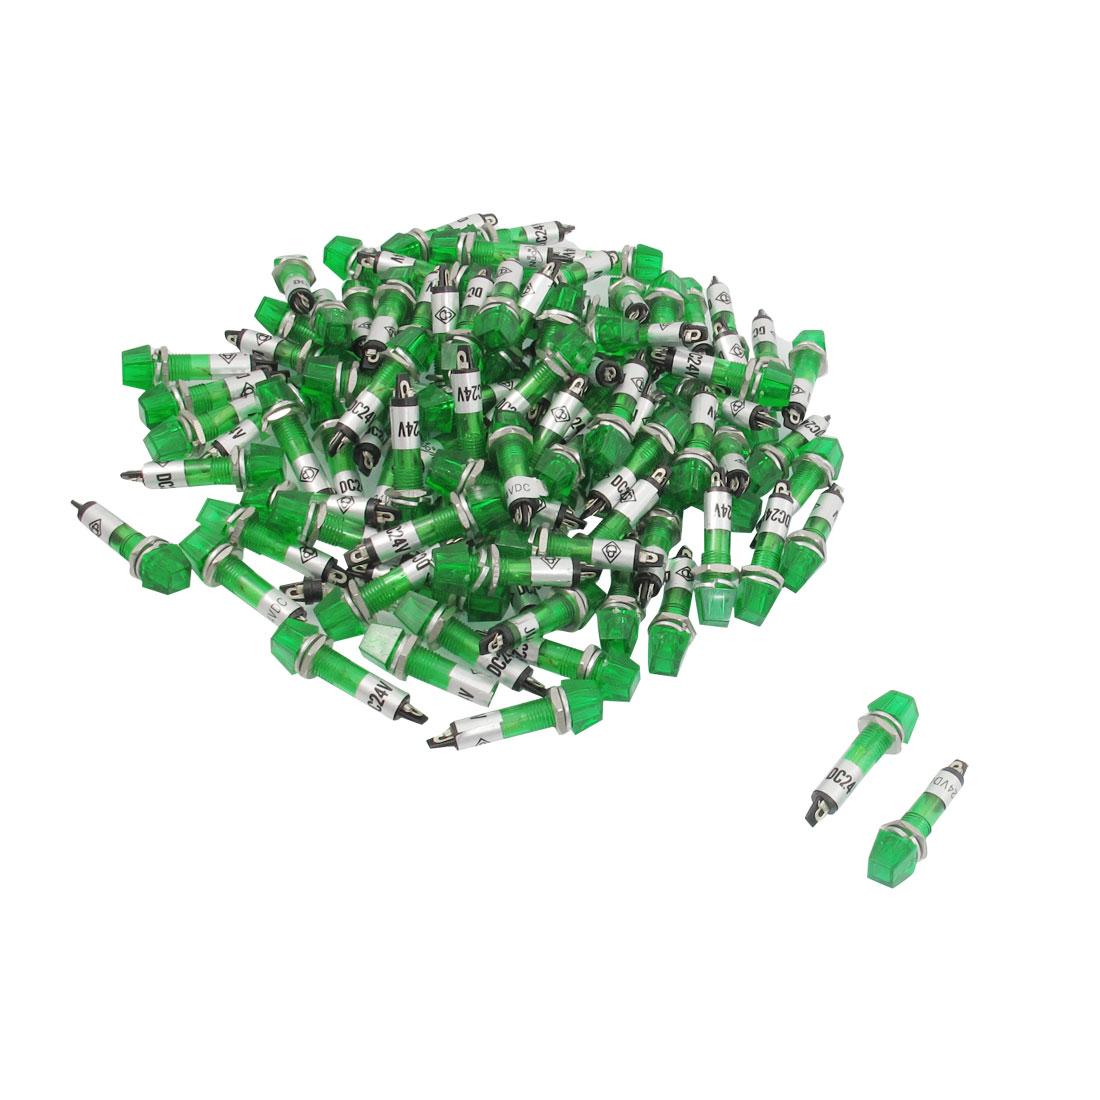 100 Pcs DC 24V 7mm Trapezoid Green Bulb Power Signal Indicator Light Pliot XD7-2